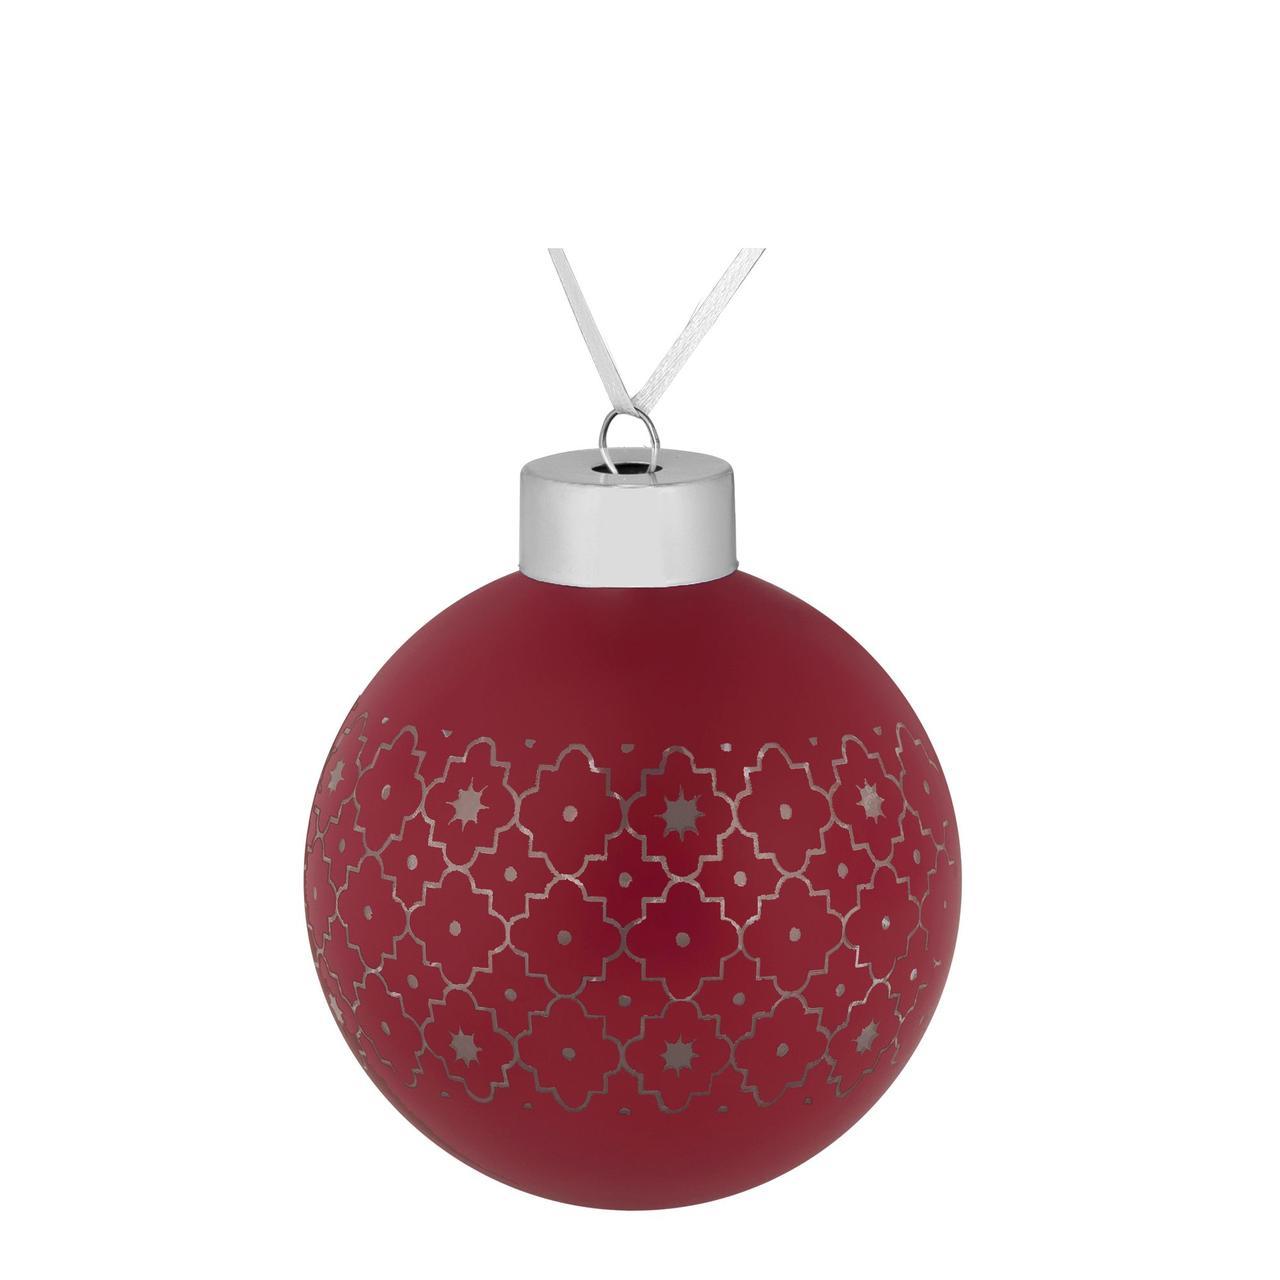 Елочный шар Chain, 8 см, красный (артикул 7169.50)